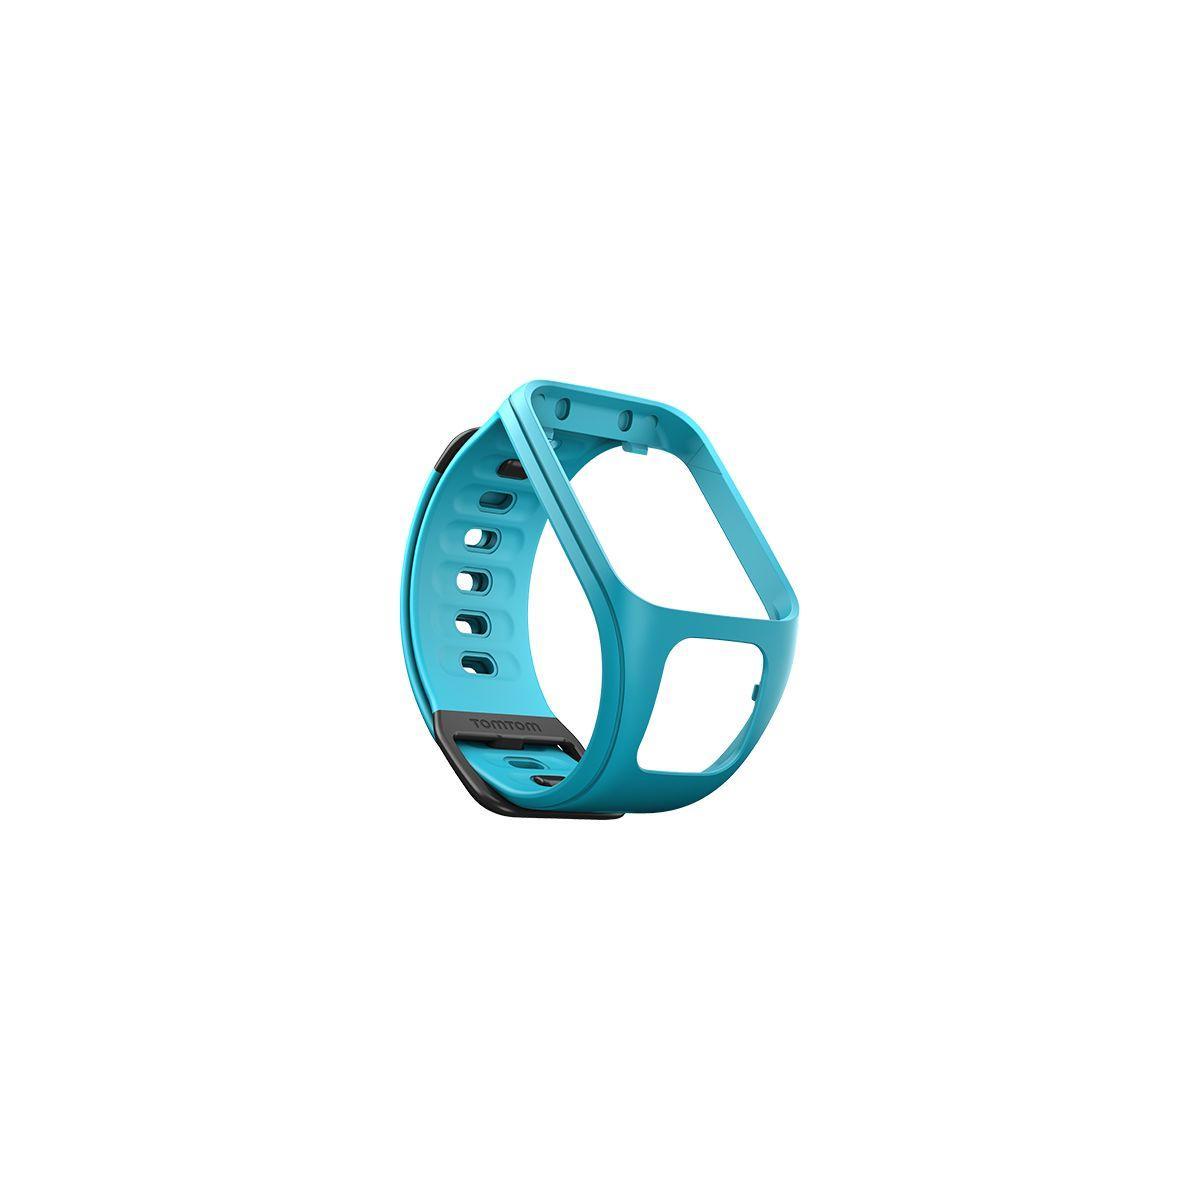 Bracelet montre tomtom bleu marine fin p - livraison offerte : code livrelais